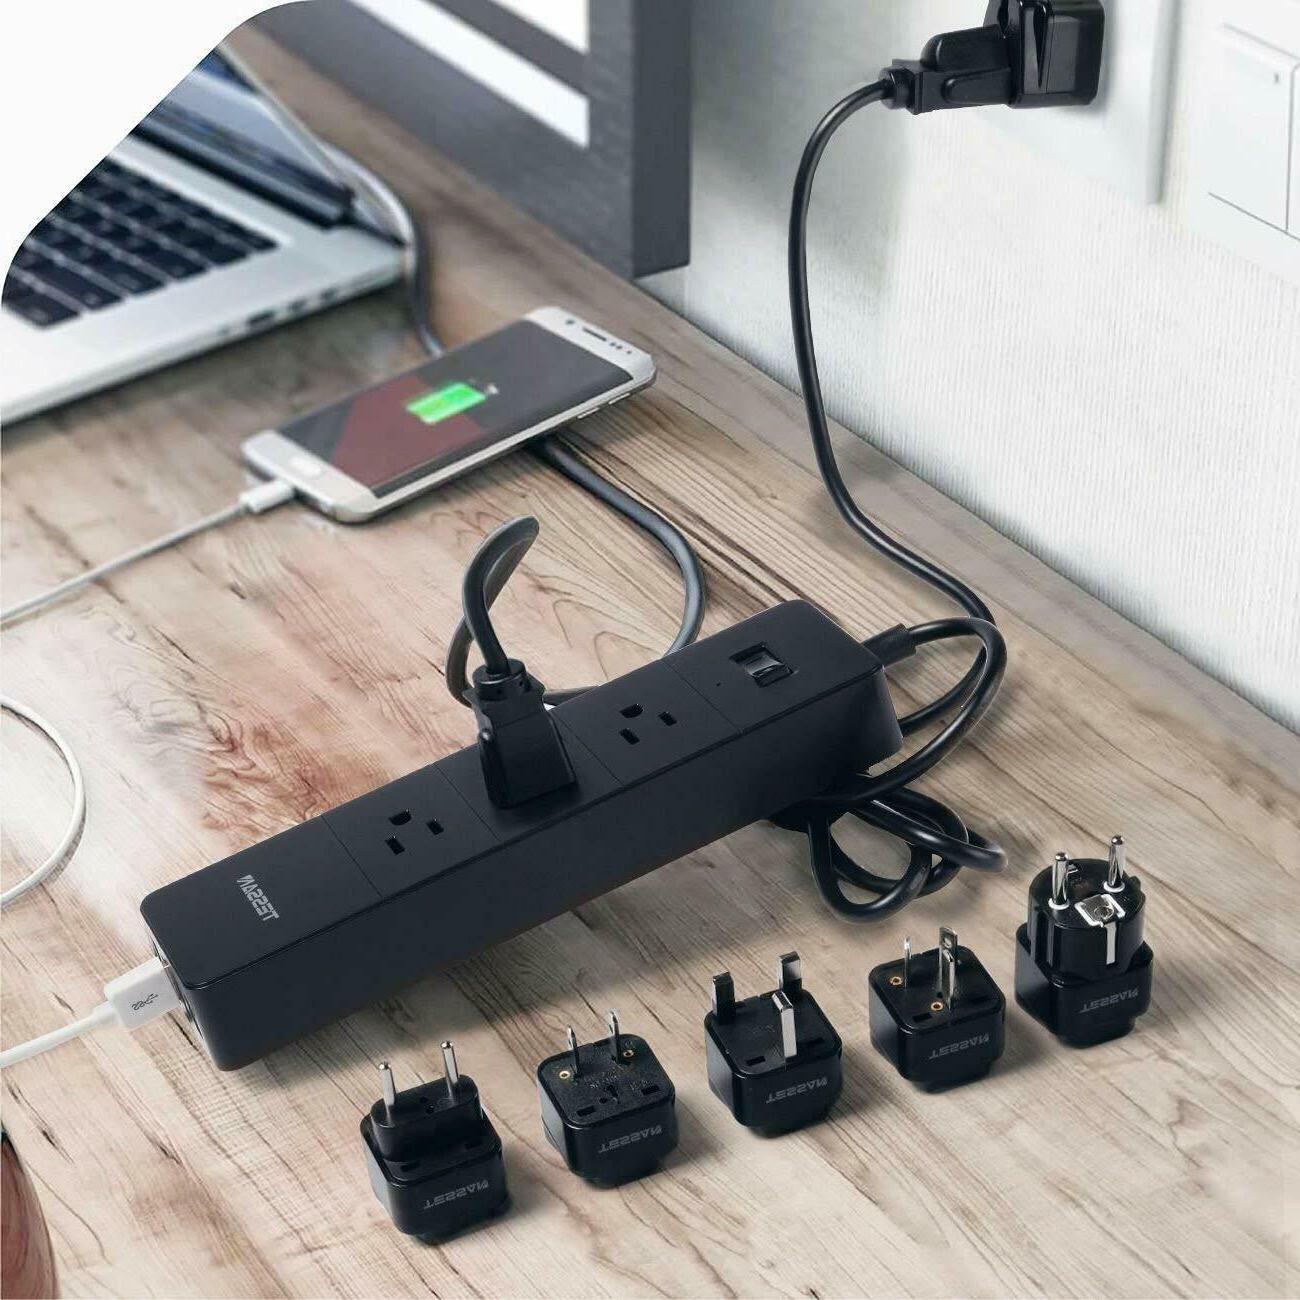 TESSAN 3 Surge Protector Power Strip 4 USB Ports